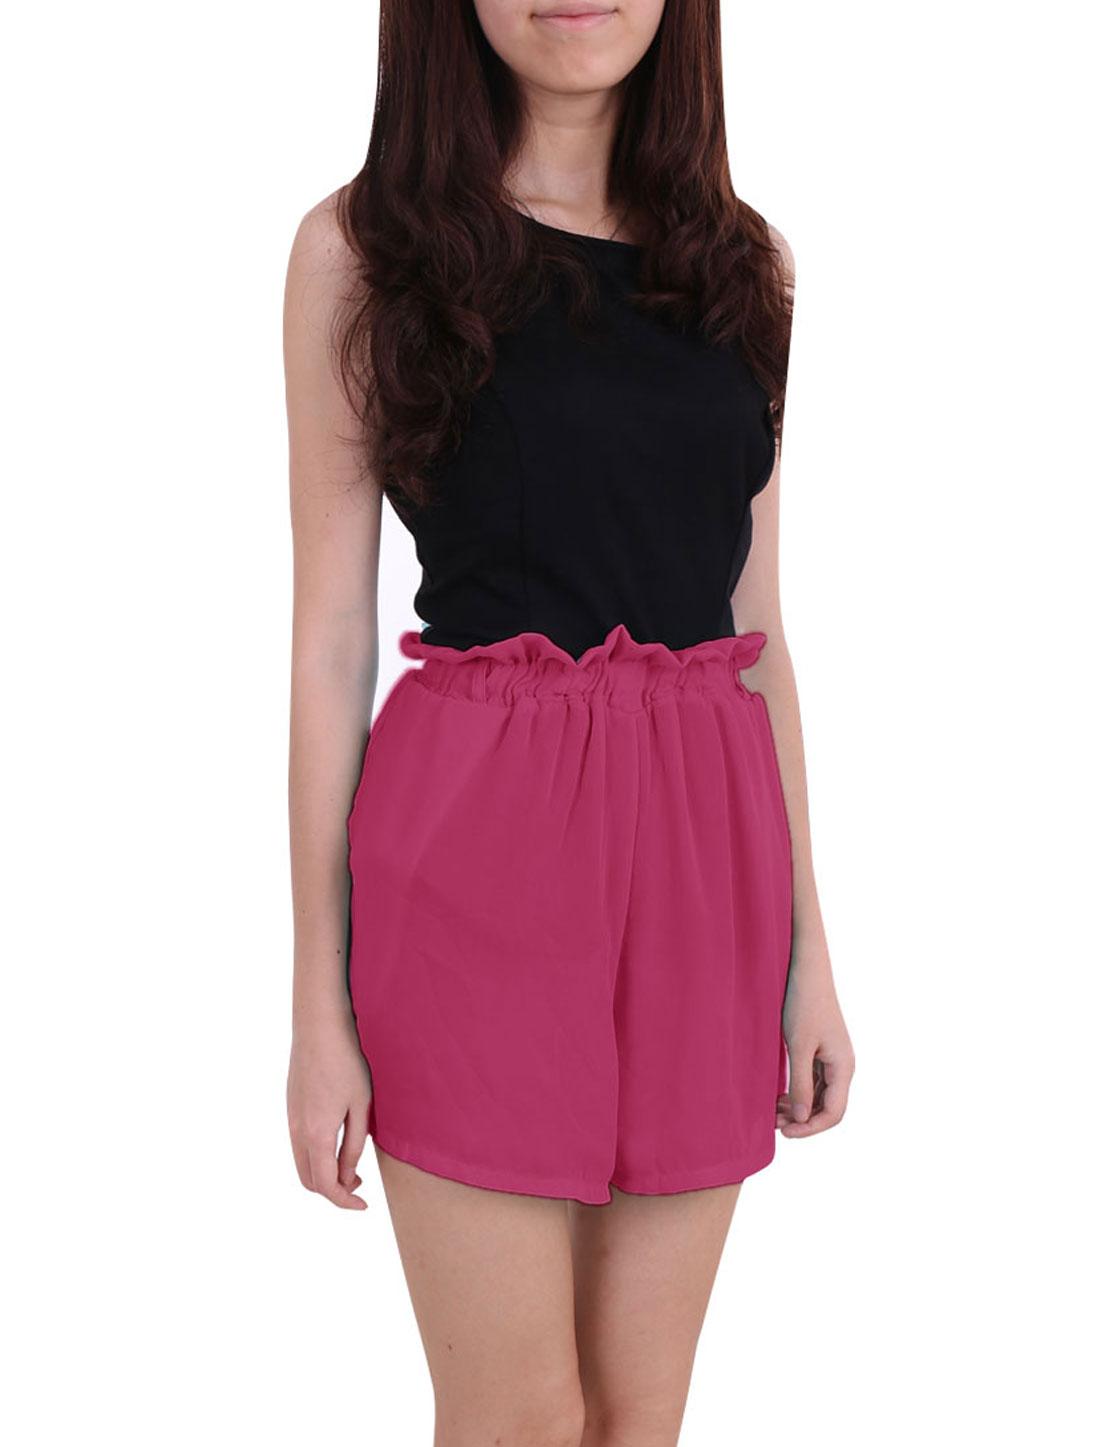 Women Ruffled Elastic High Waist Chiffon Mini Shorts Pink XS